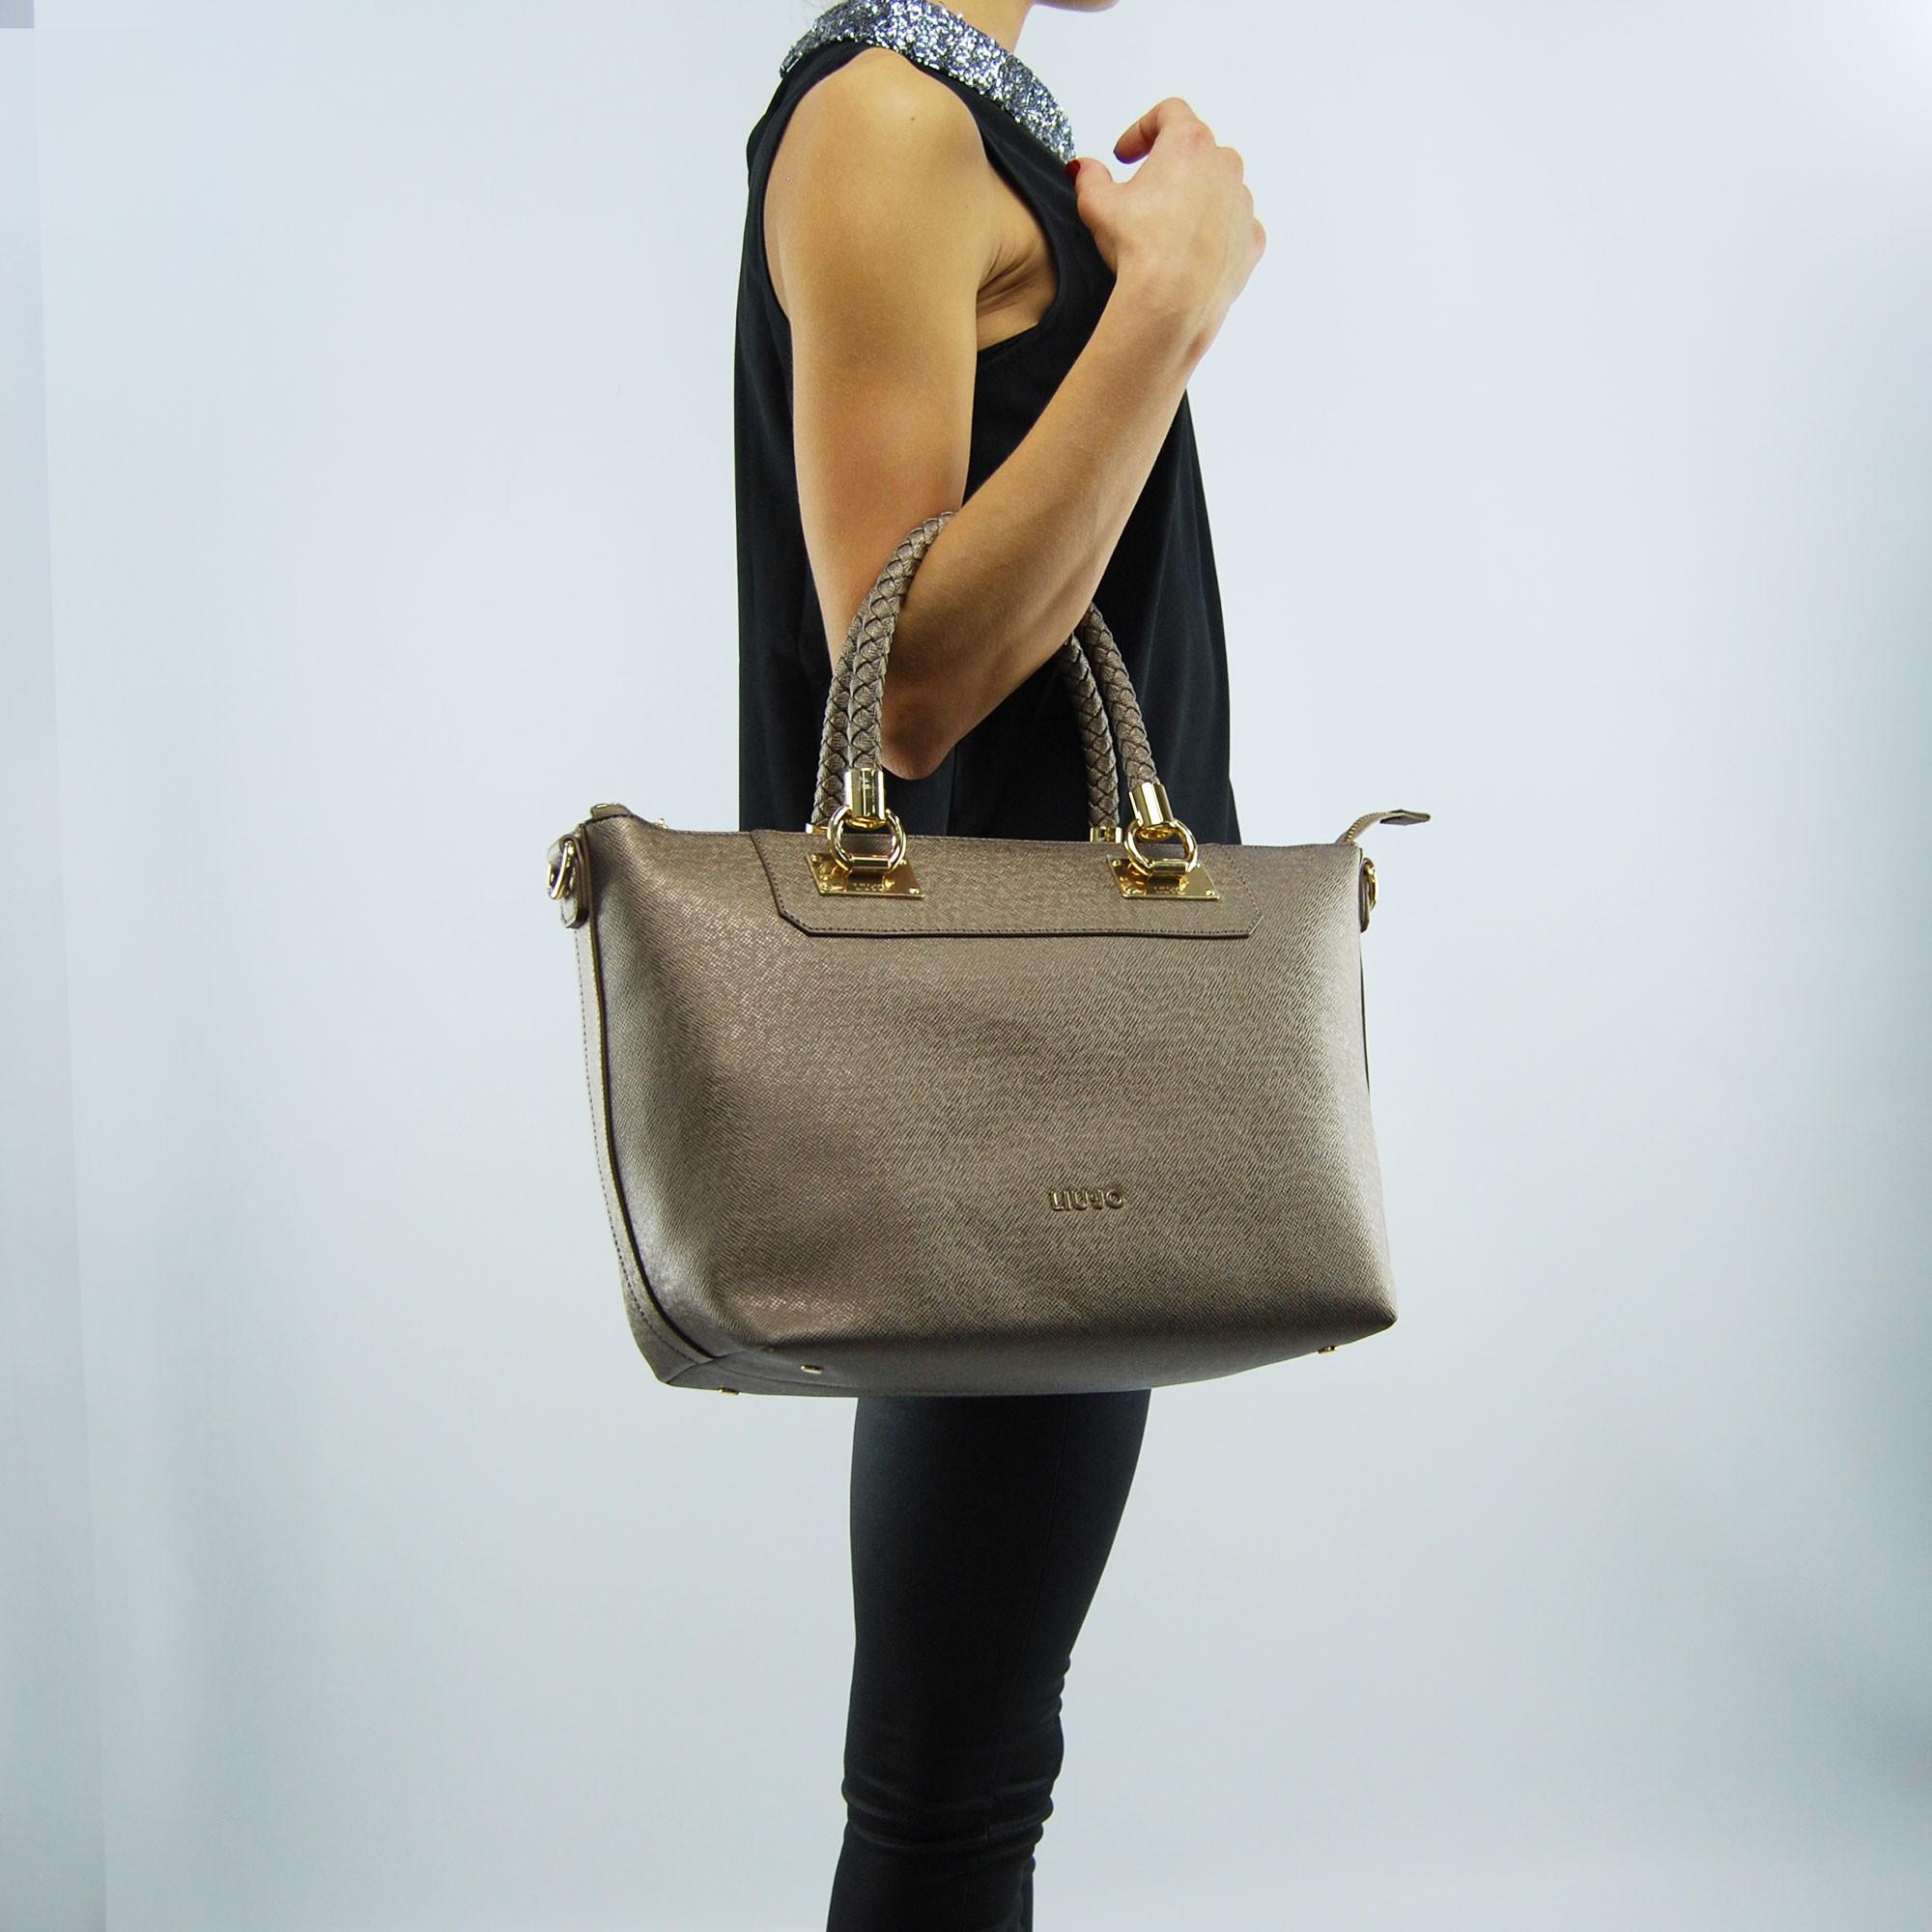 4ea8a6bf2d16a Shopping bag horizontal Liu Jo anna pale brown metal. Tap to expand